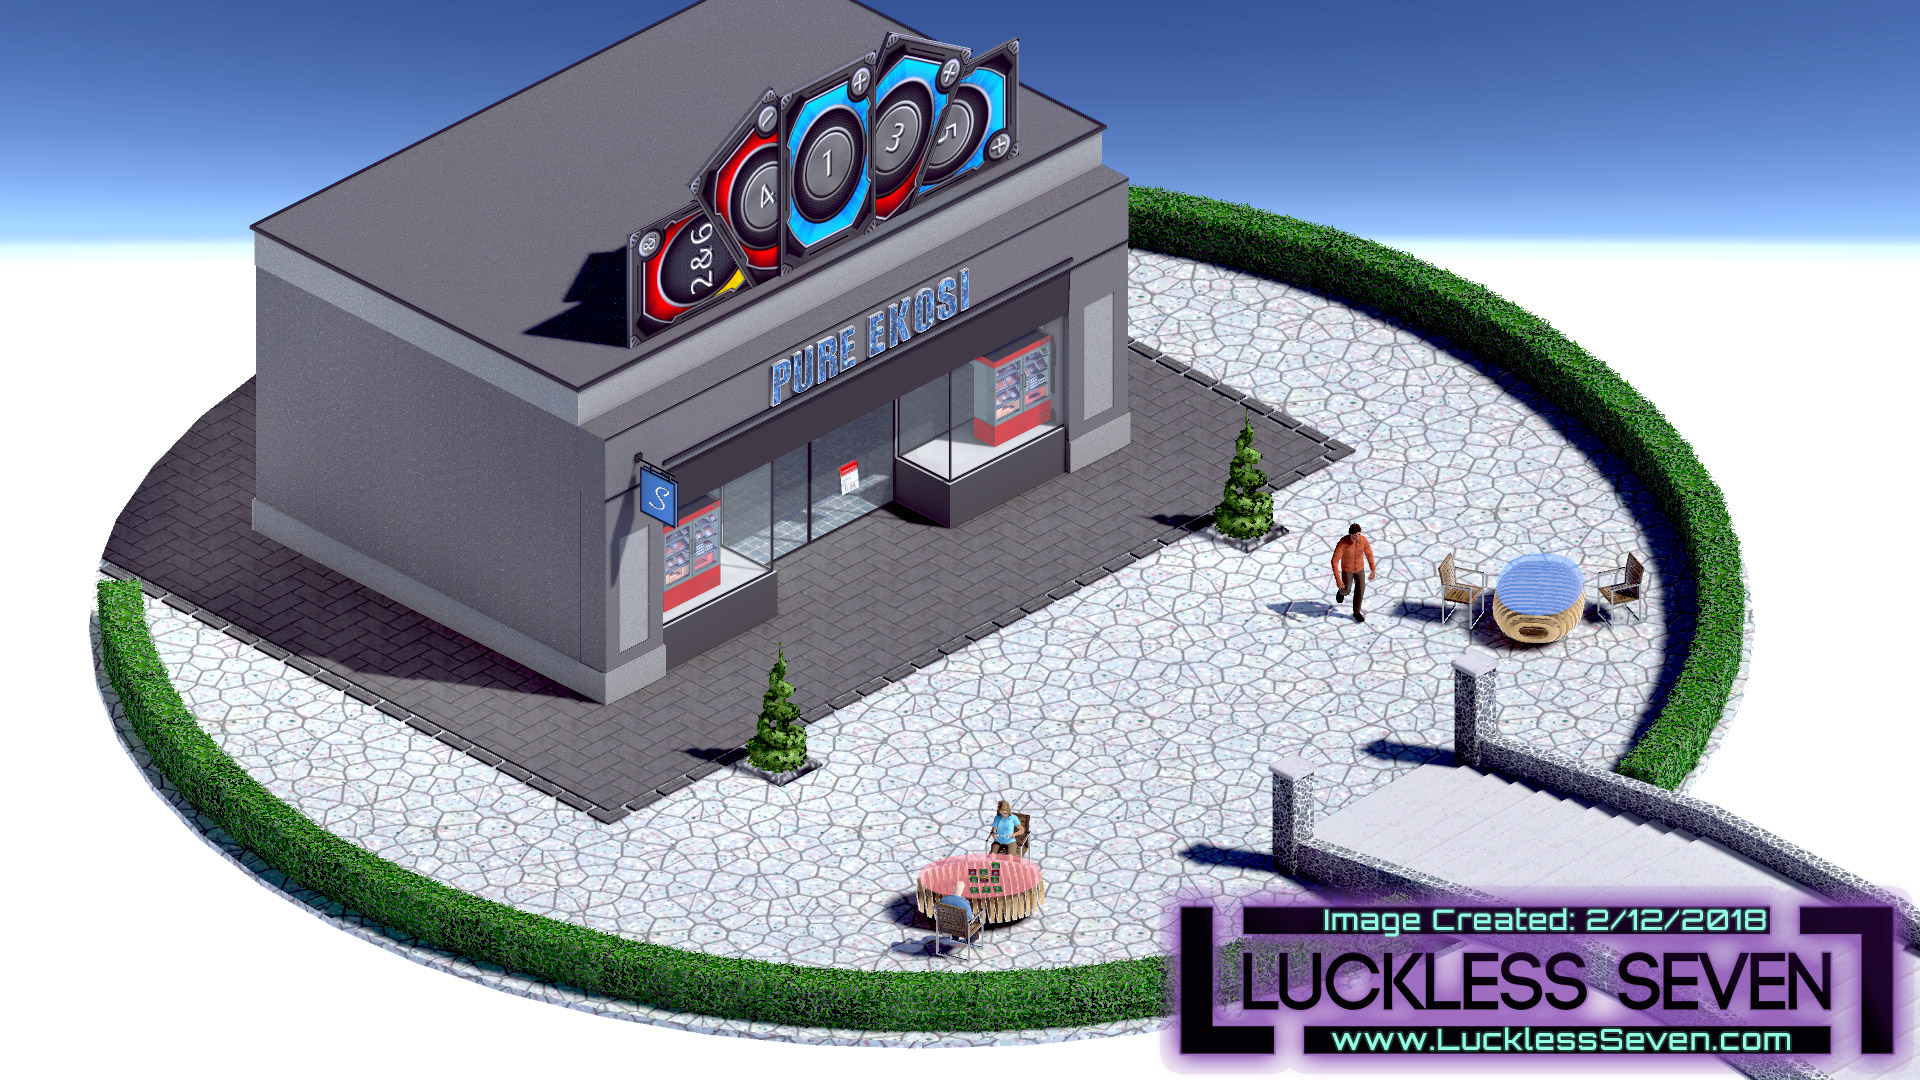 Luckless Seven Amethyst Casino E 2